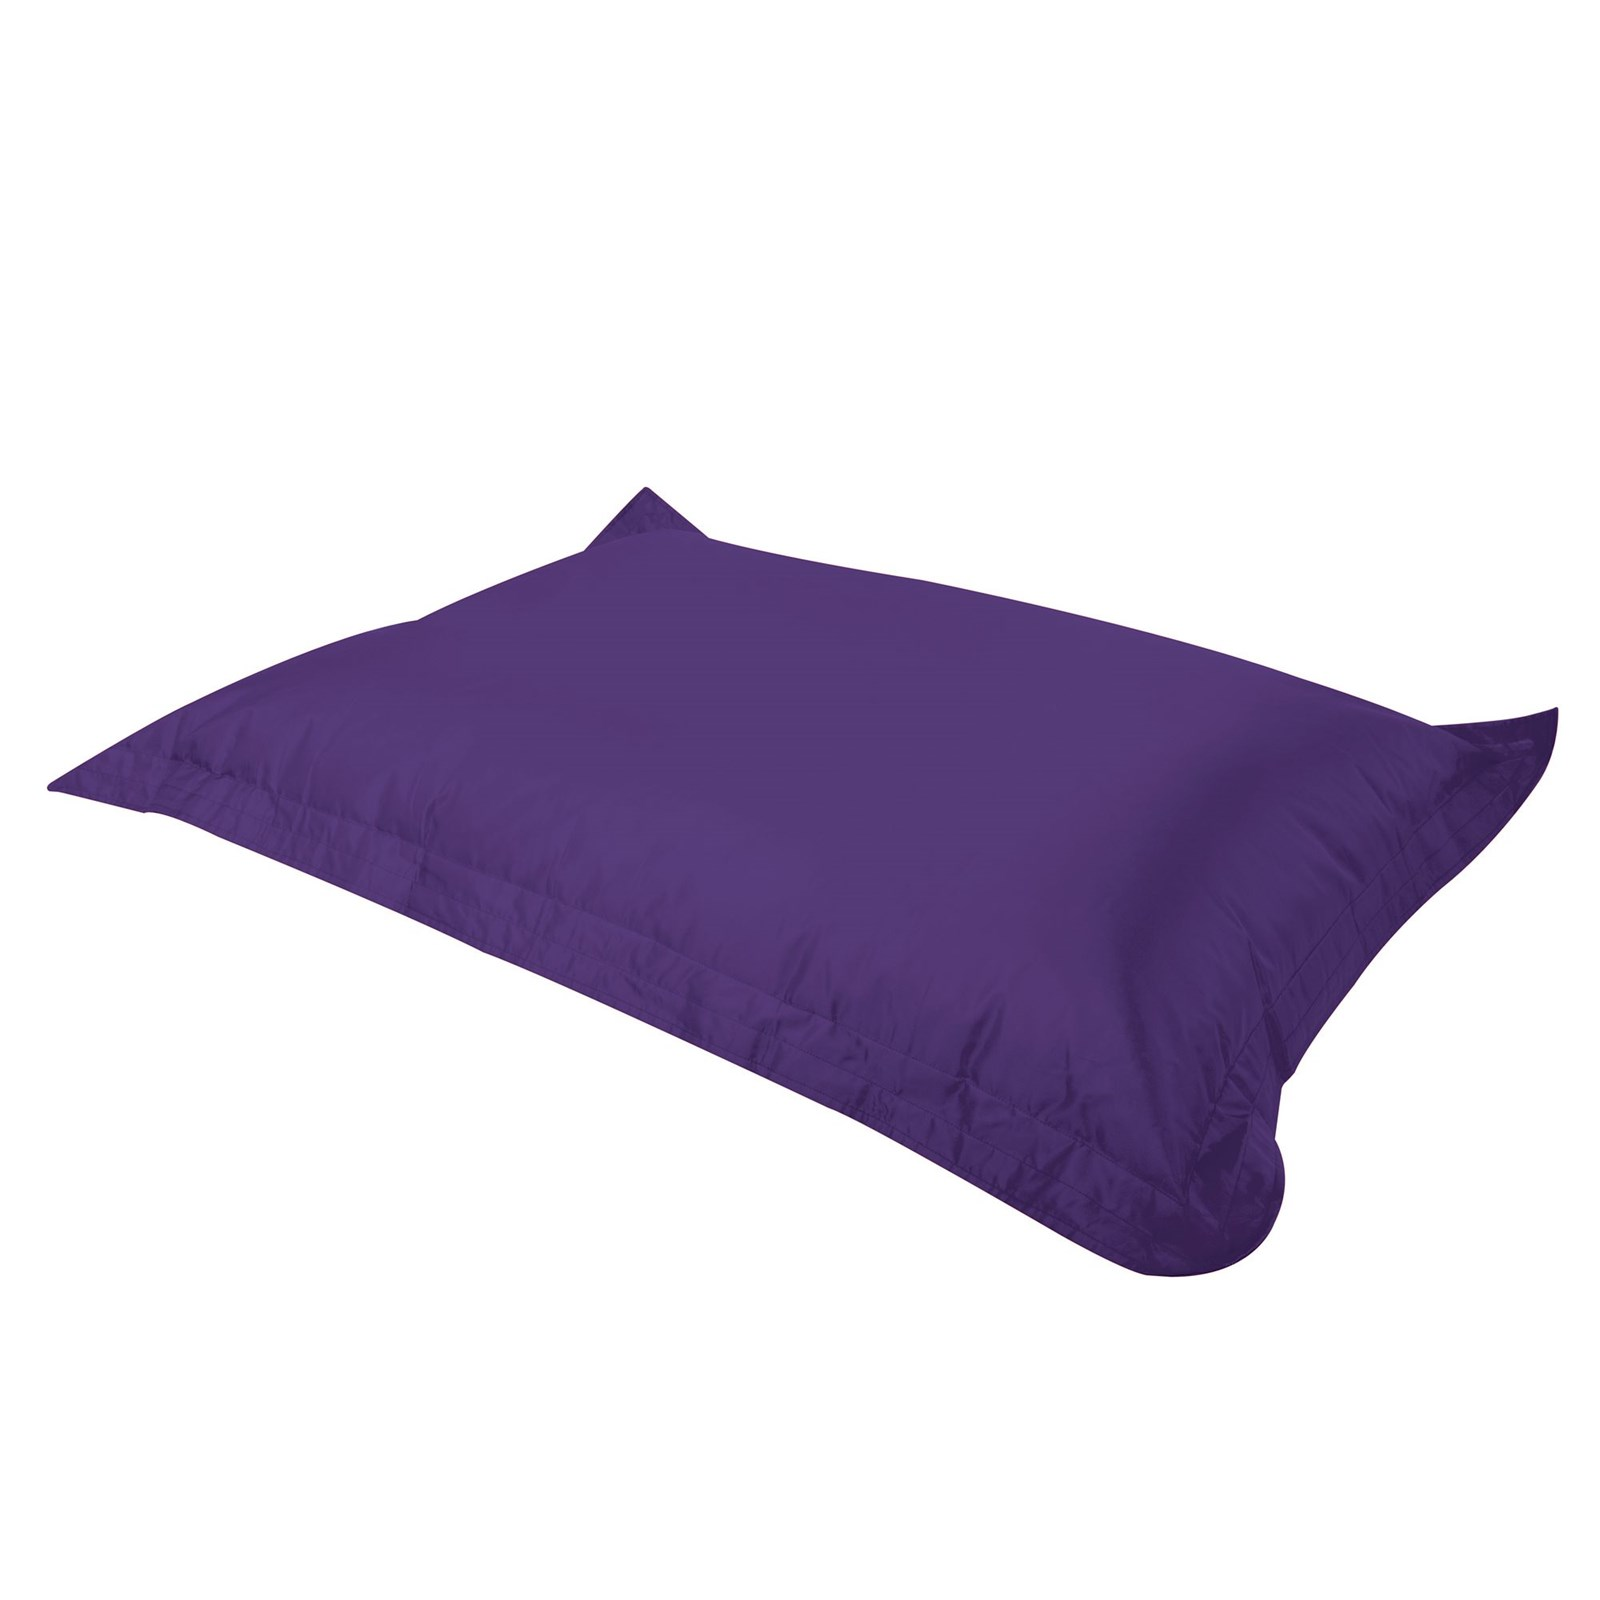 Giant Beanbag Cushion - Purple